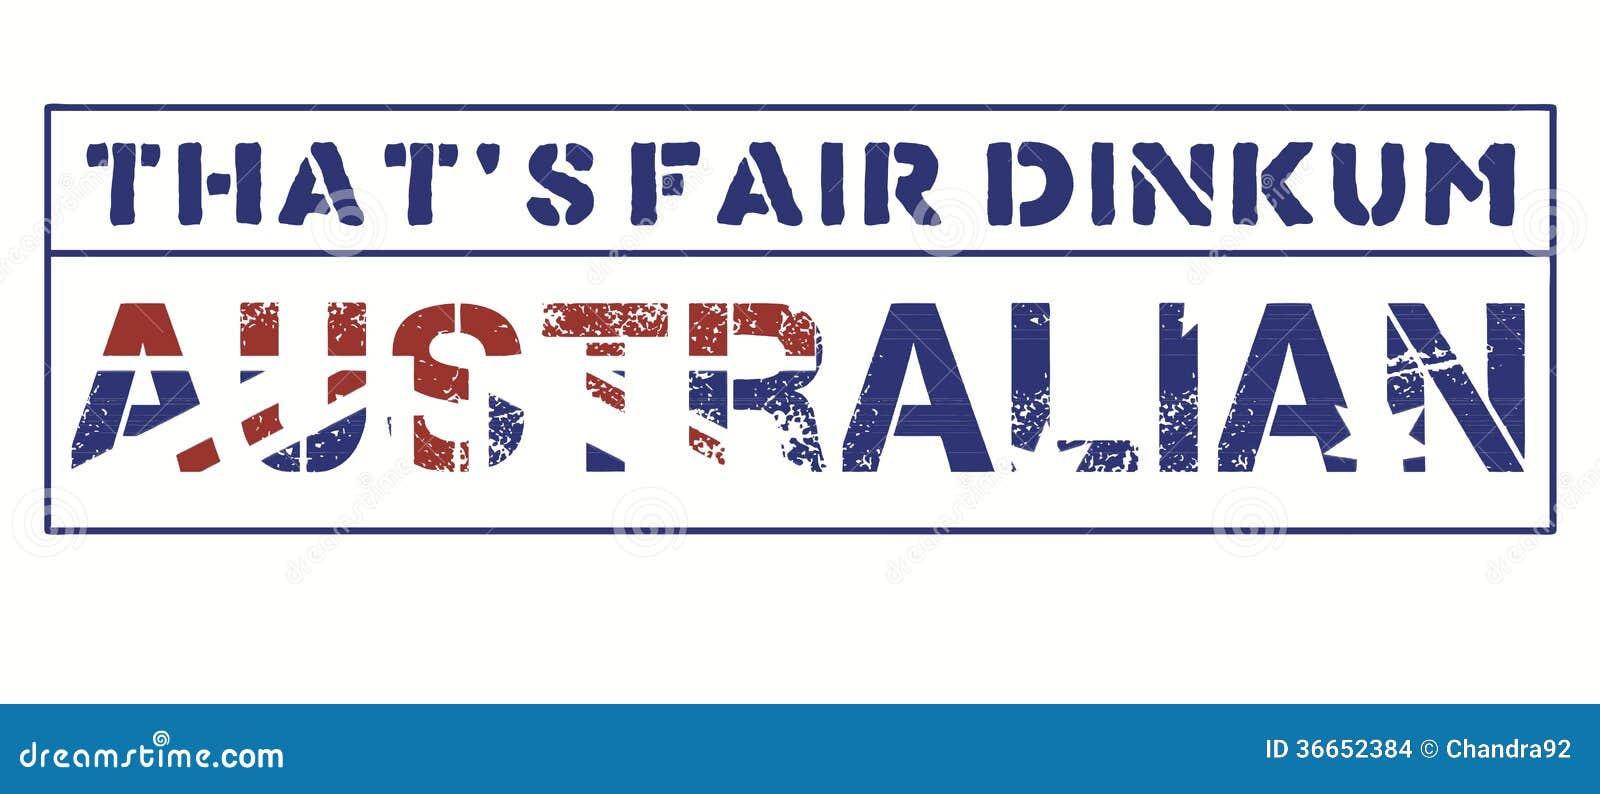 Thats fair dinkum australian stock photo image of thats 2016 royalty free stock photo kristyandbryce Gallery